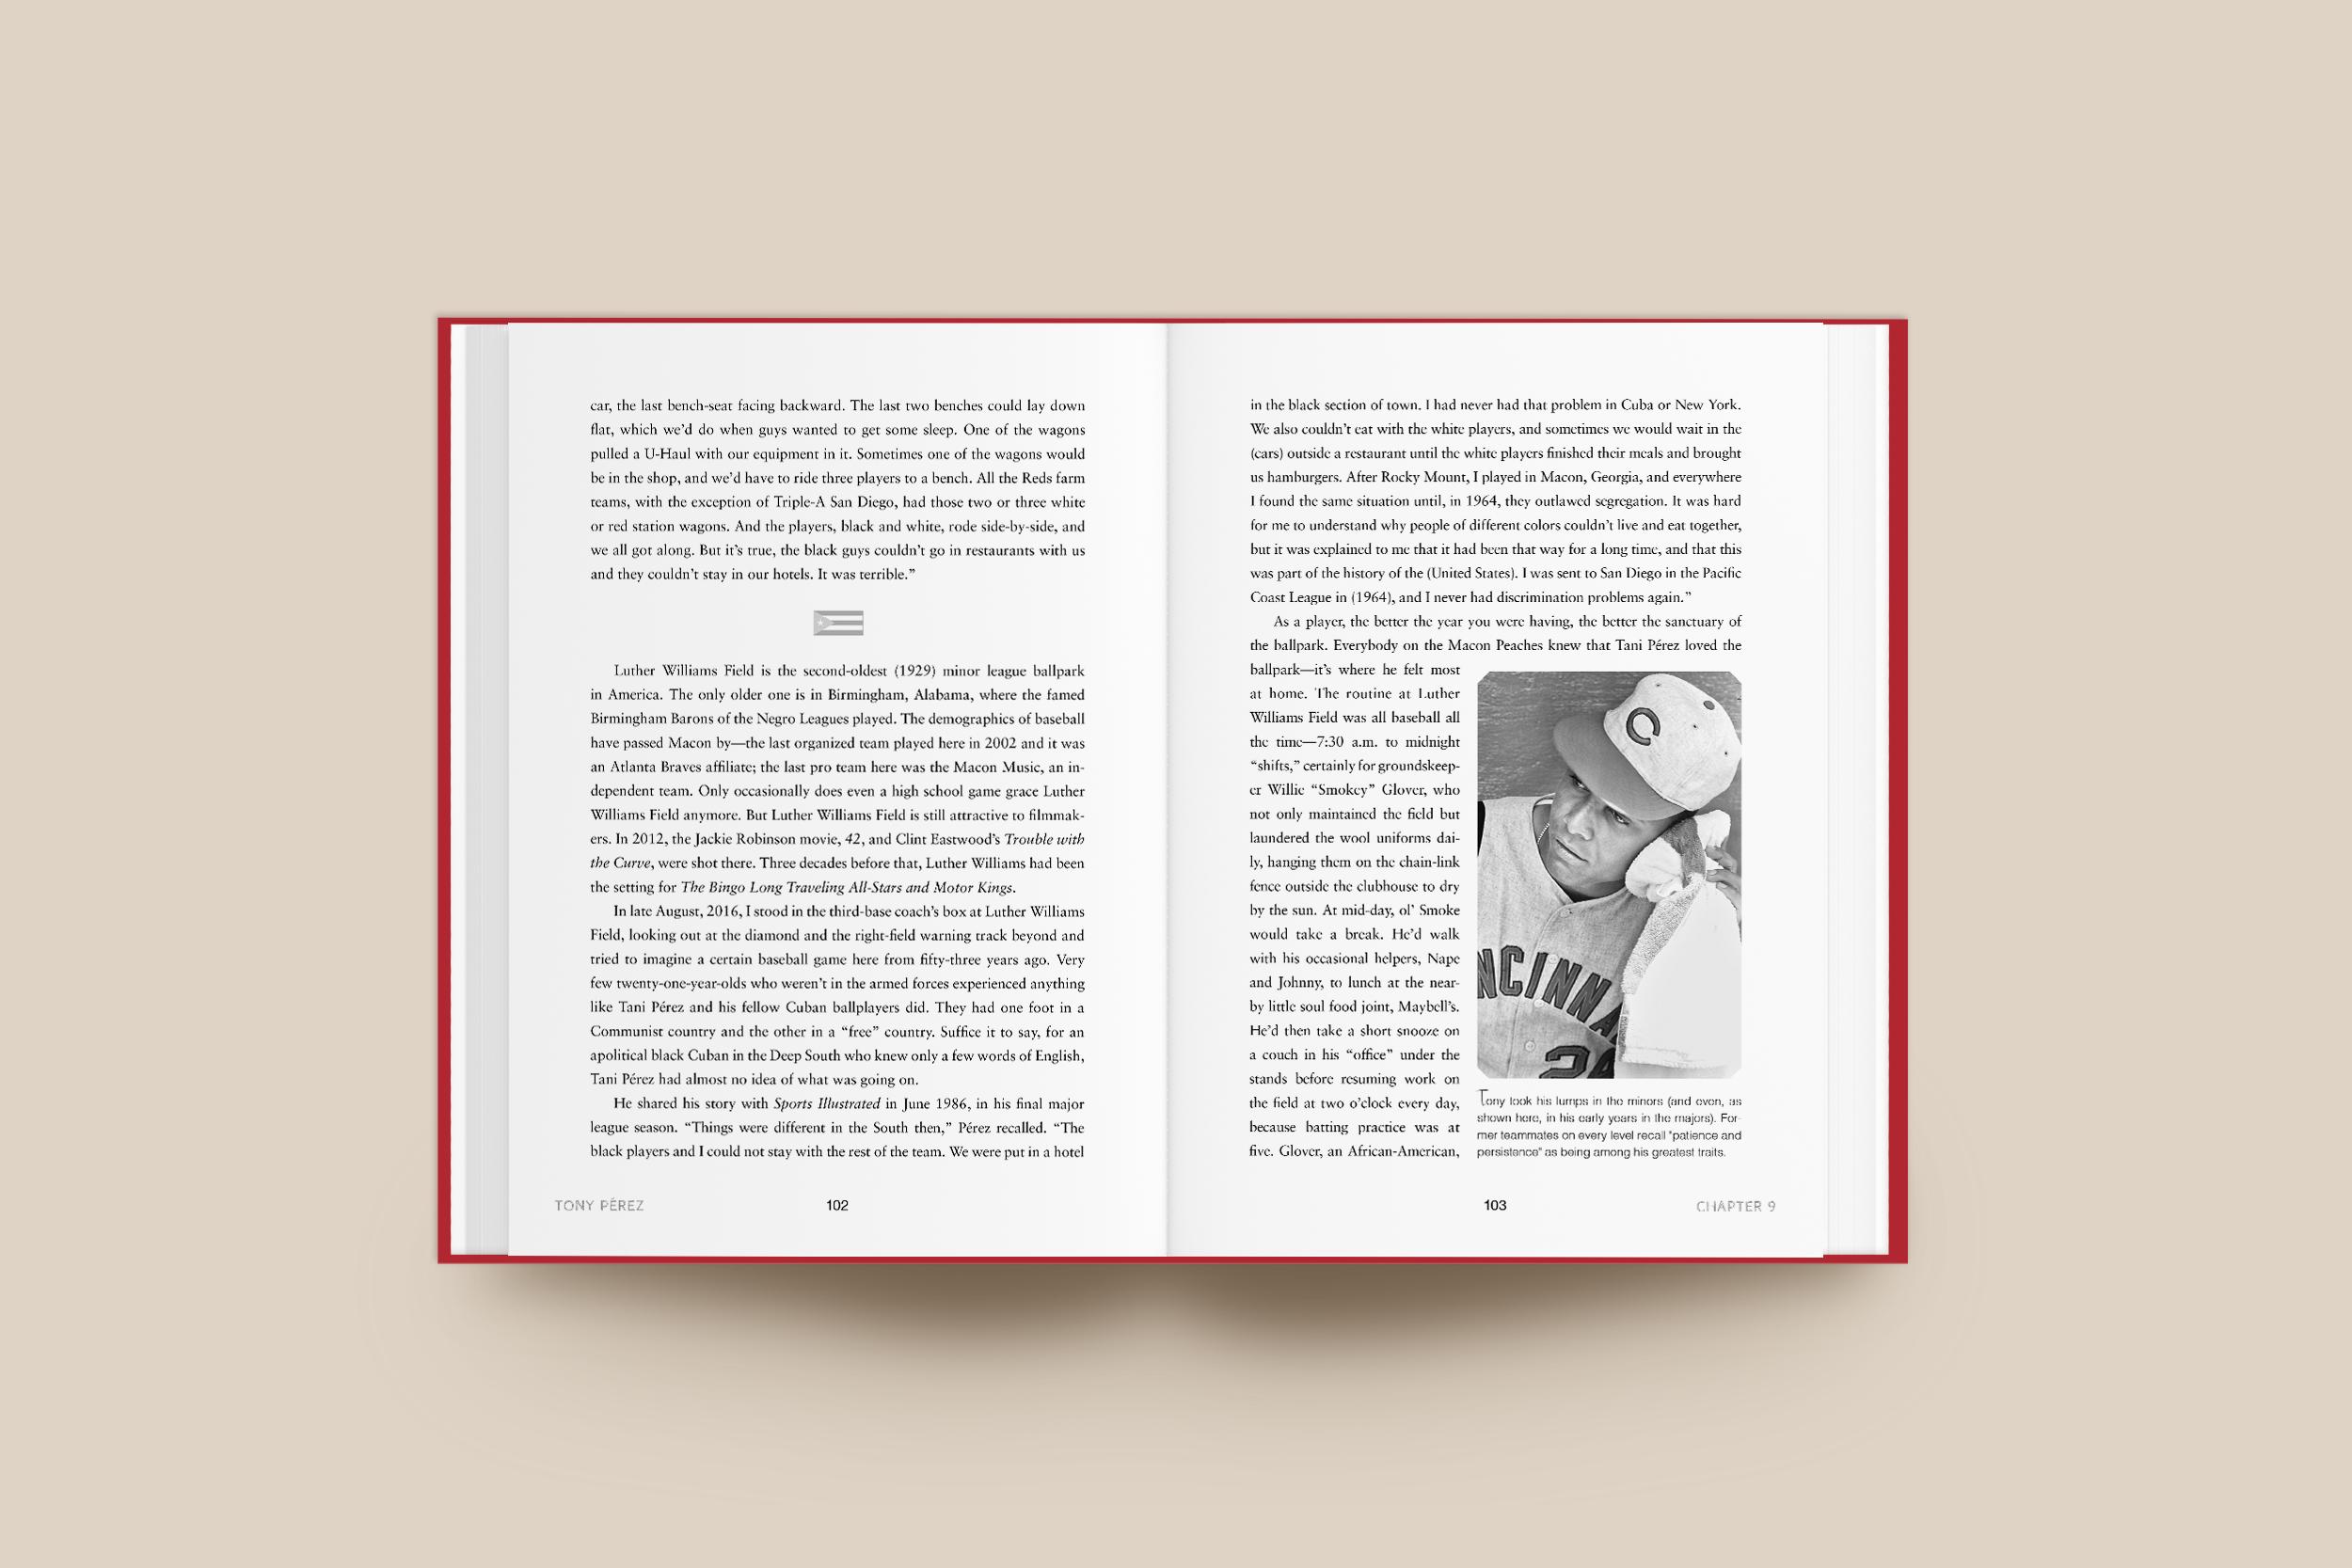 Tony_Perez_Book_Inside_2.png